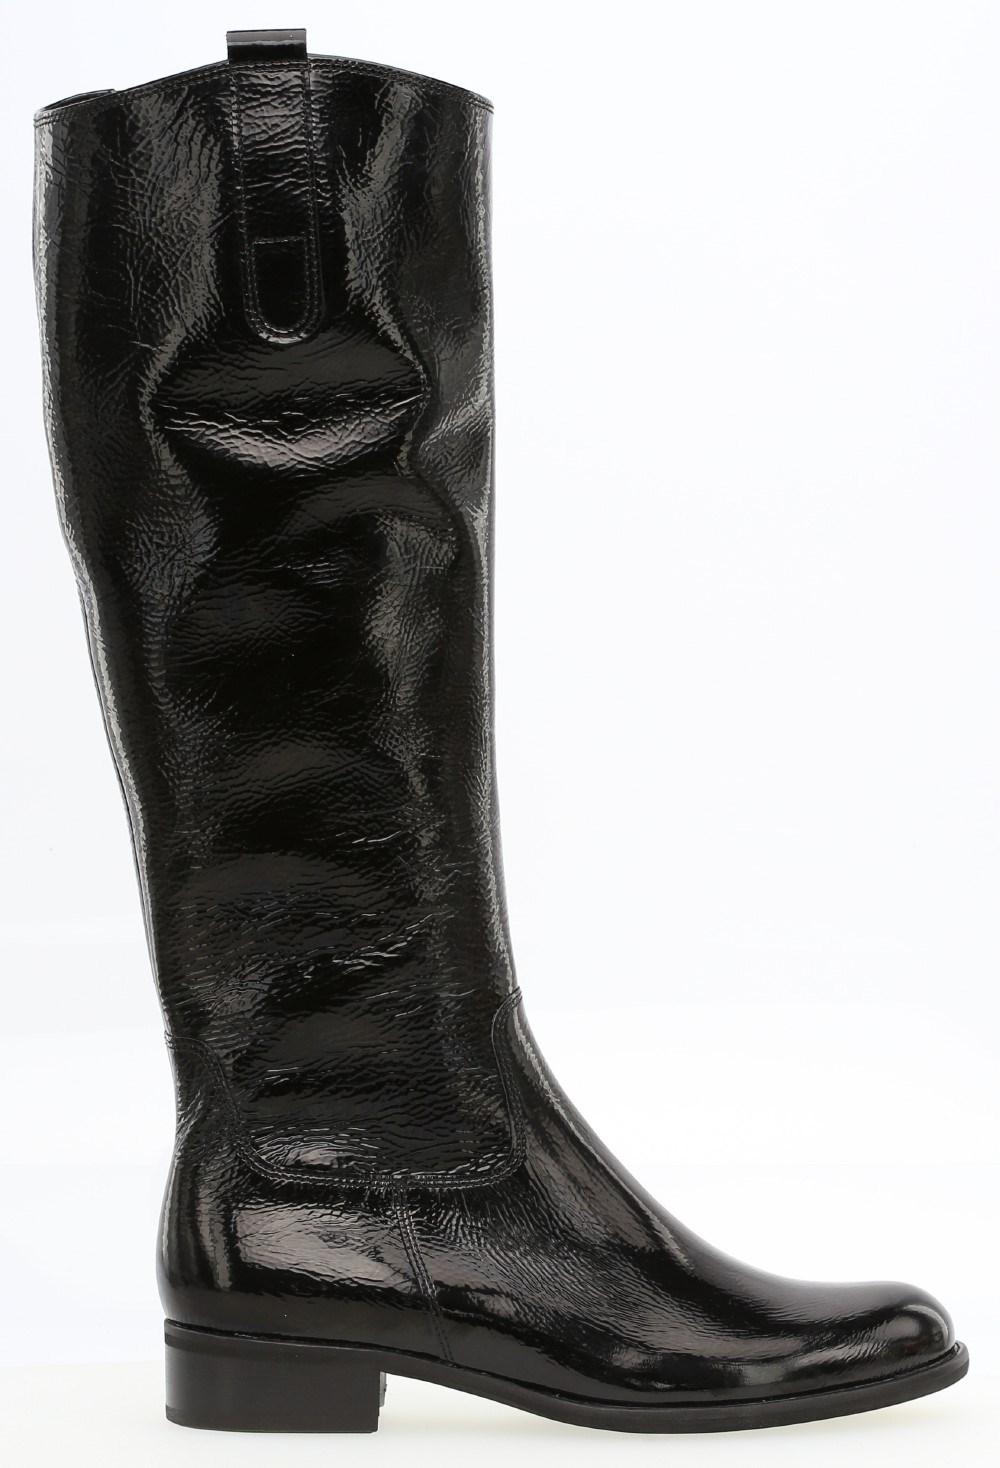 Gabor 'Brook' Black Patent Long Boot